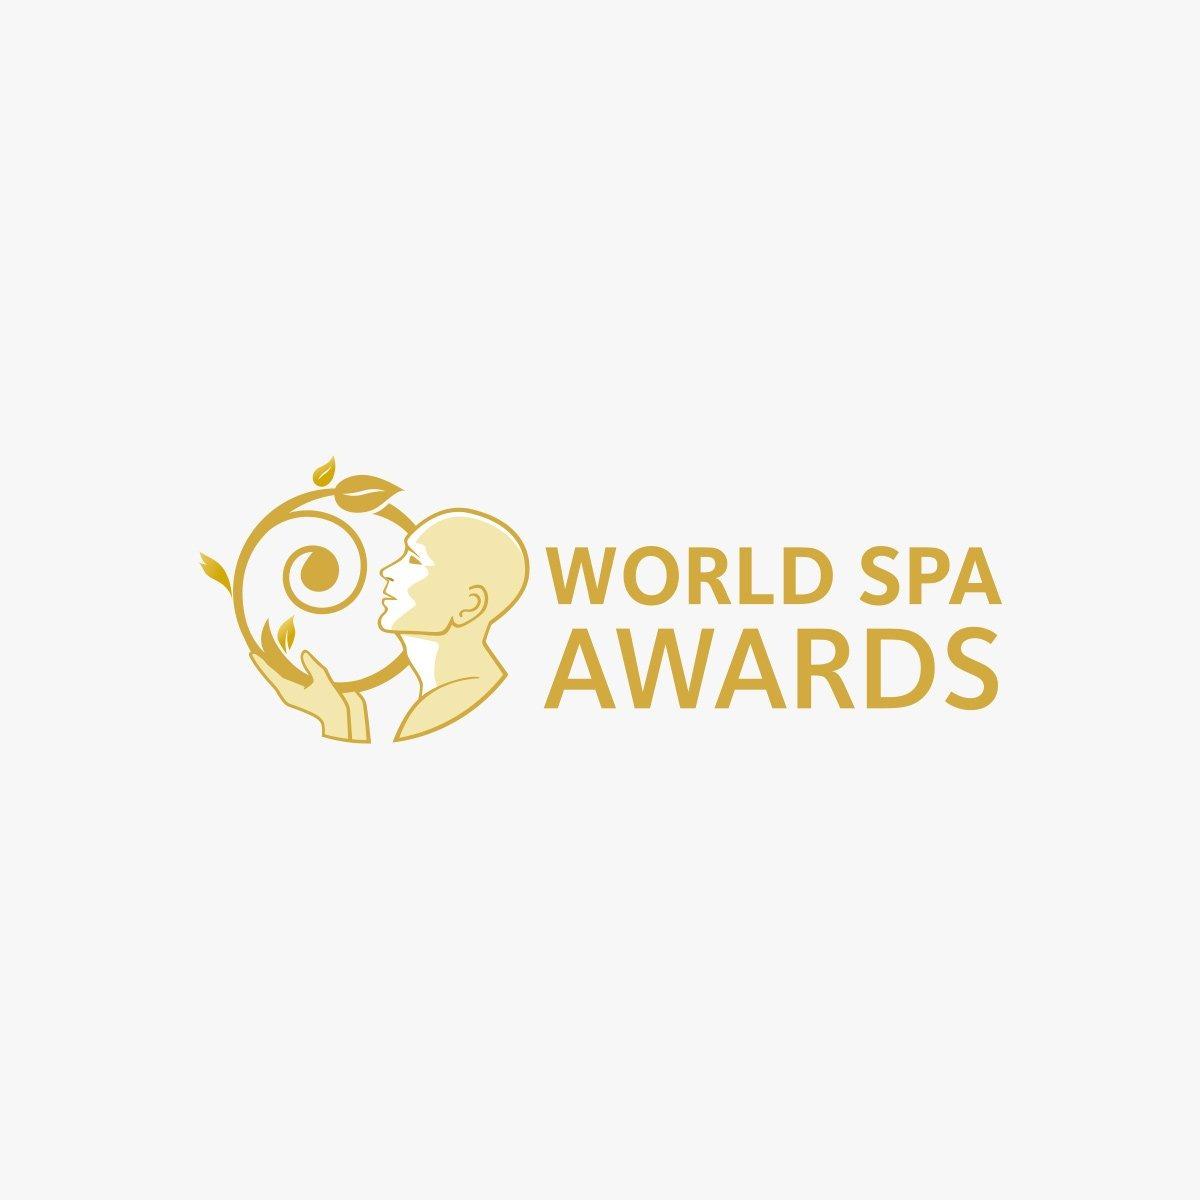 World Spa Awards Logo